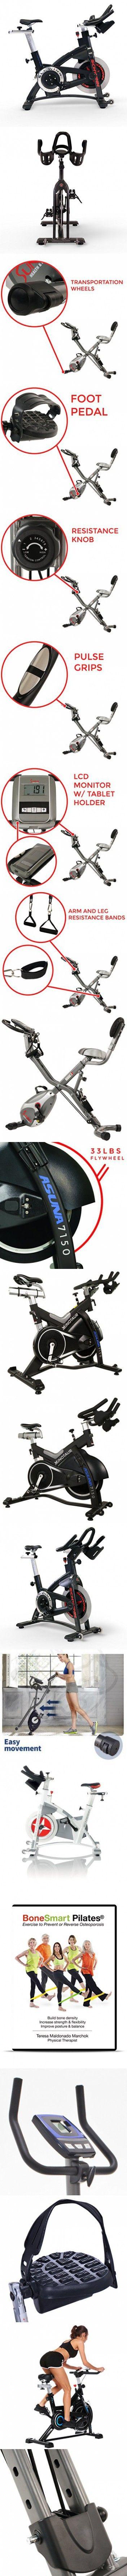 Schwinn AC Performance Plus Indoor Bike with Carbon Blue Belt Drive and Morse Taper - Quantum Silver